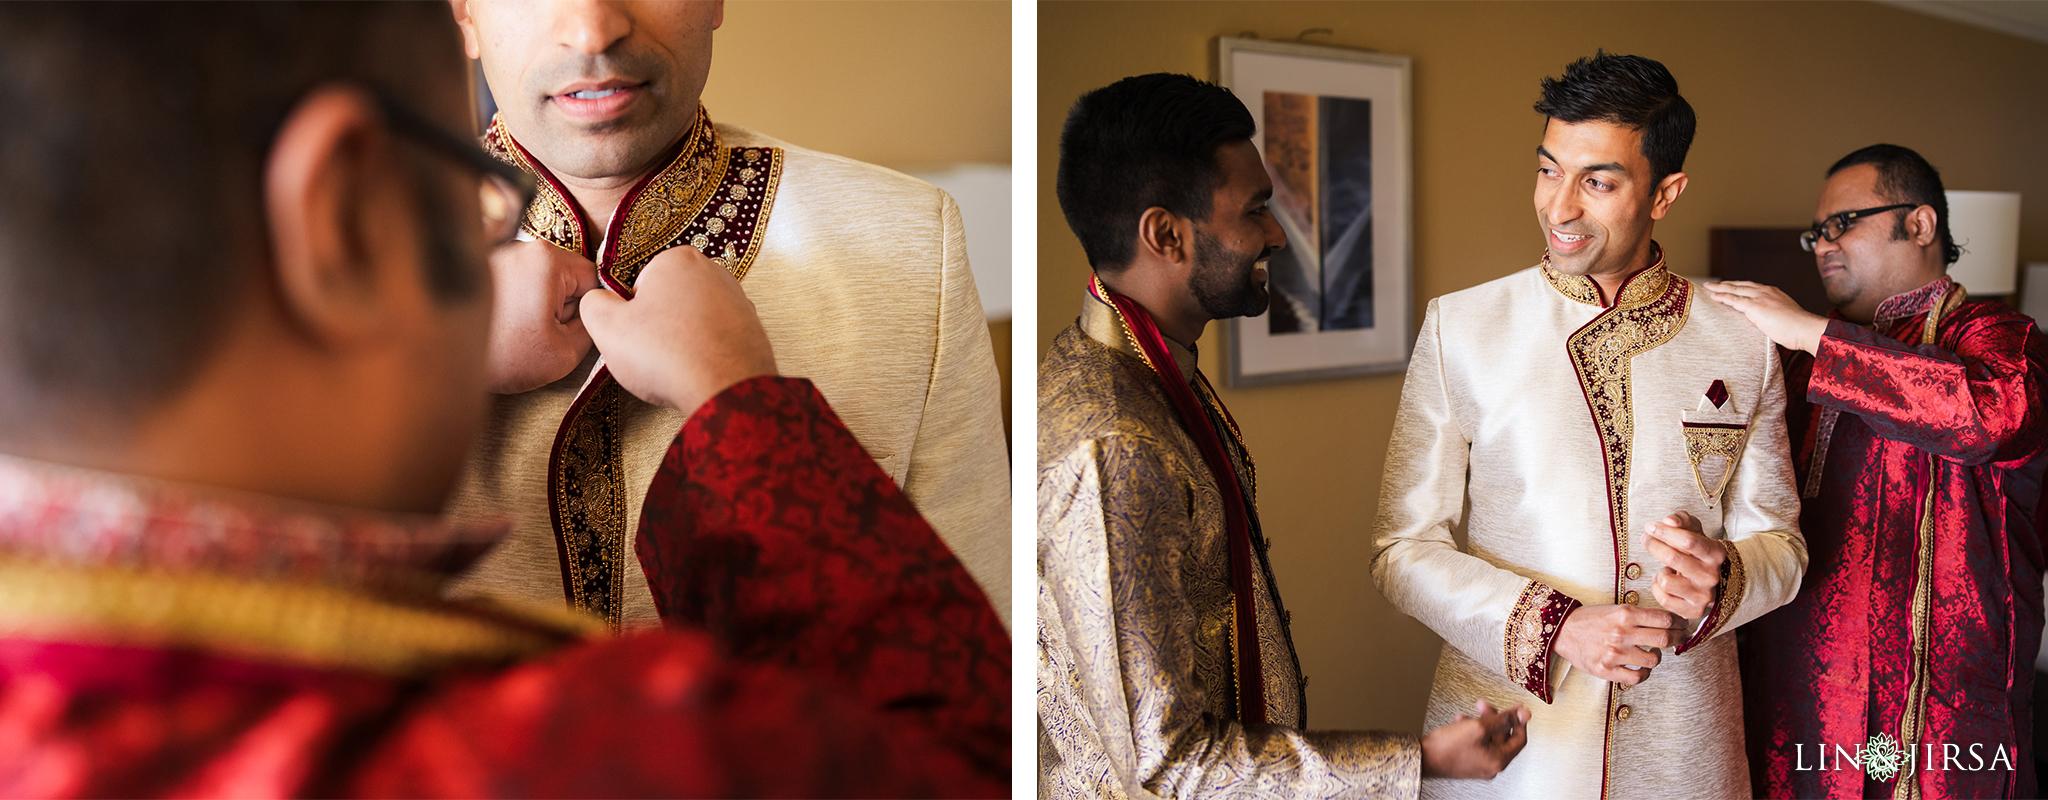 03 Newport Beach Marriott Indian Wedding Photography